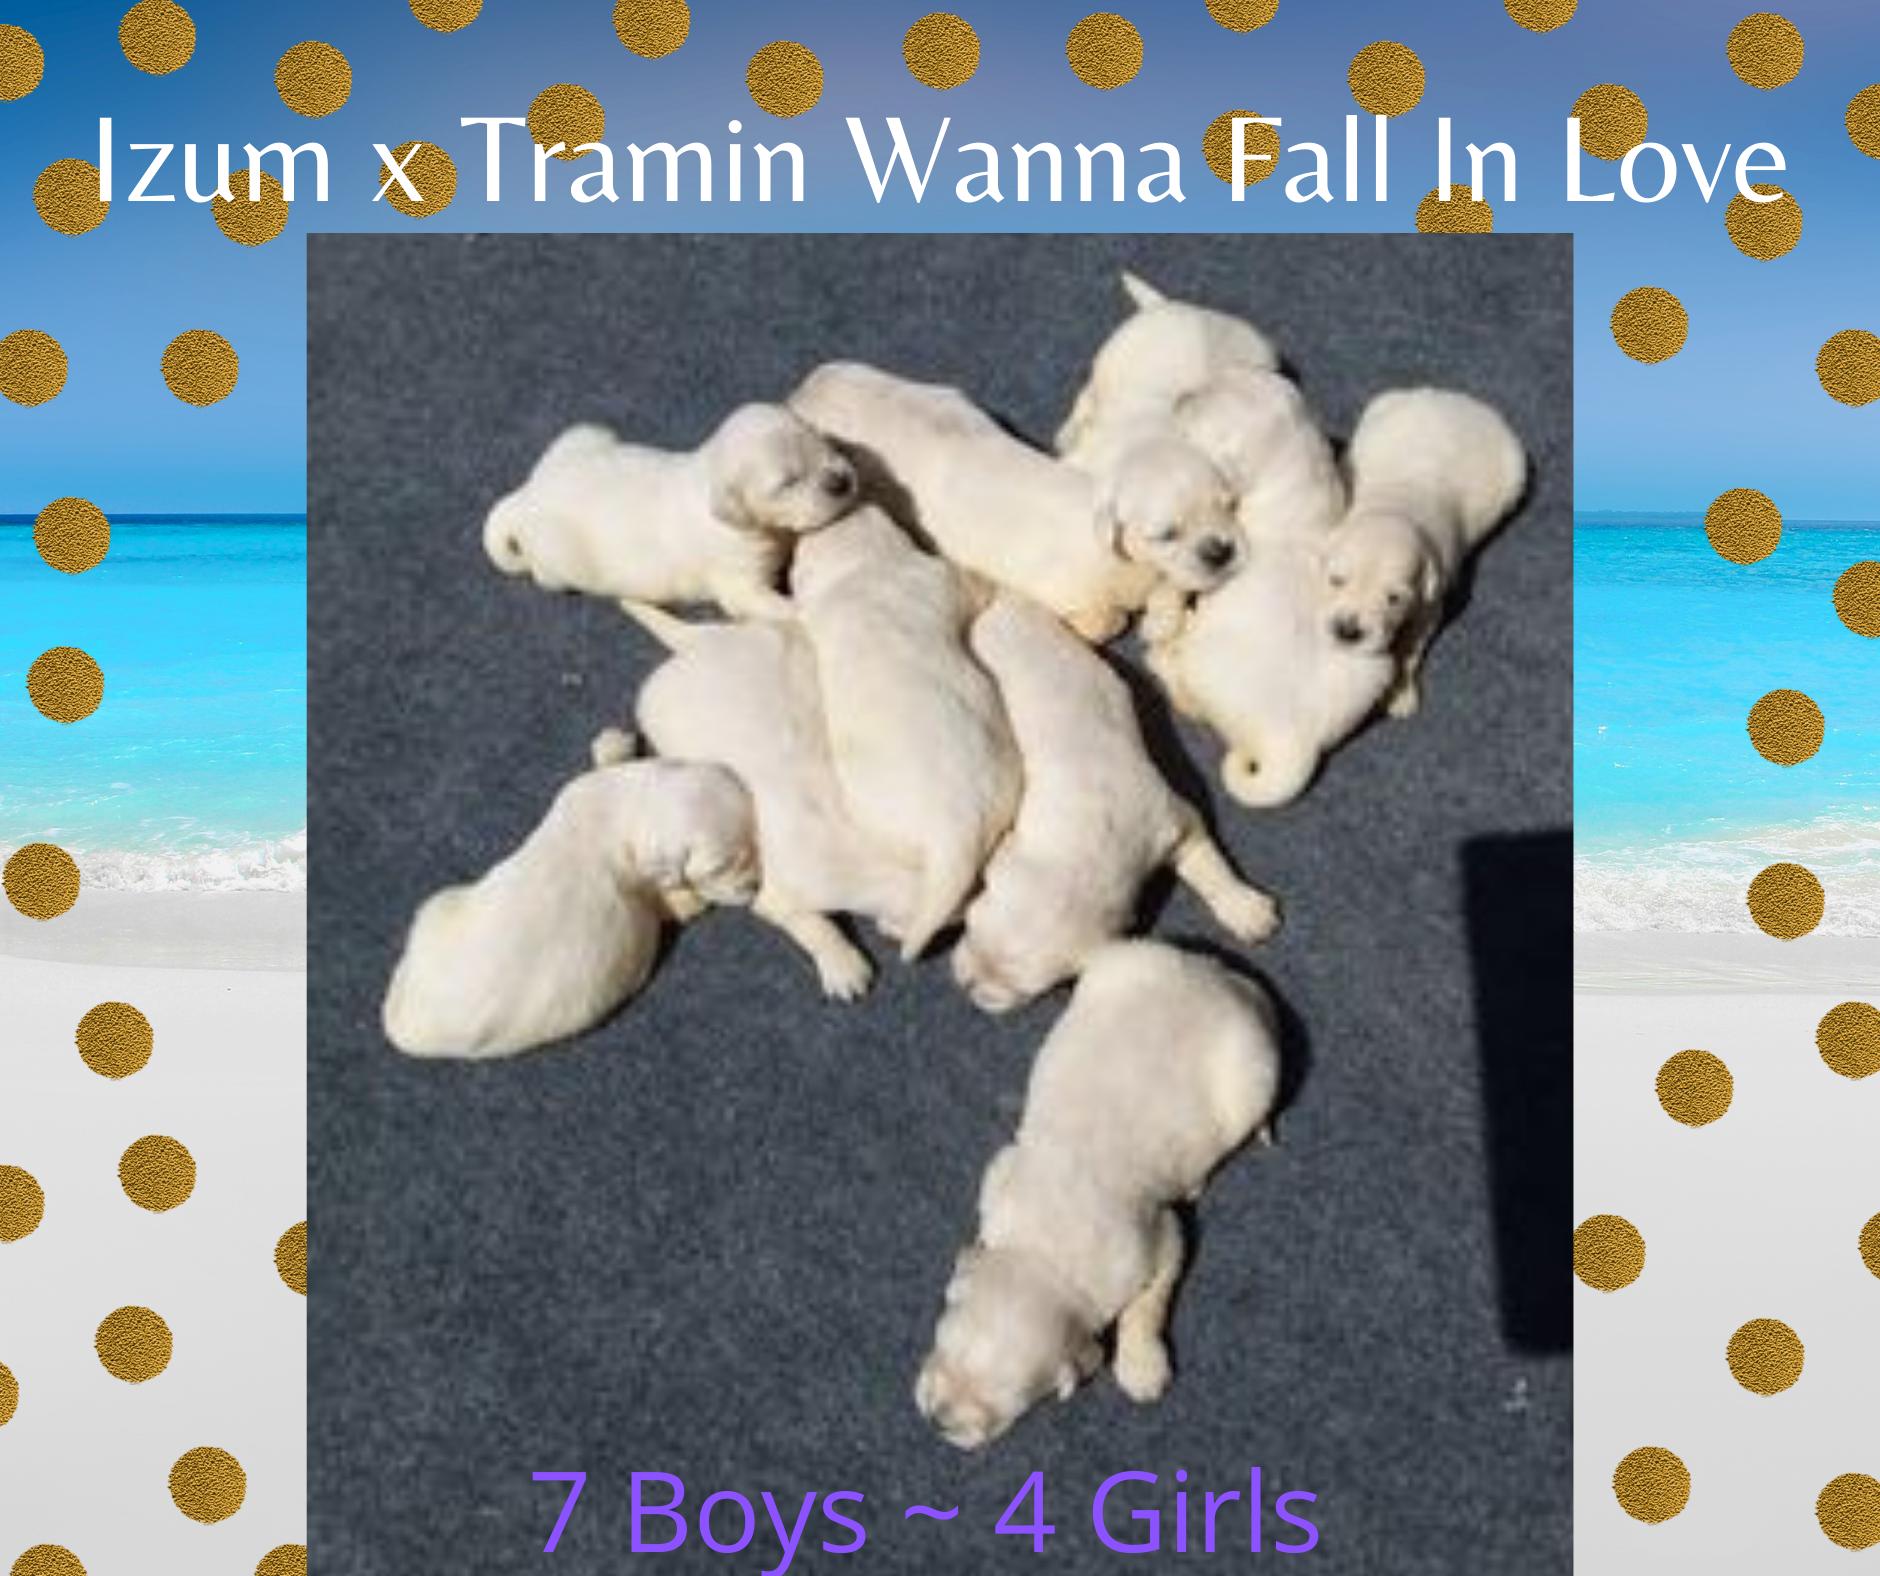 Izum x Tramin Wanna Fall In Love